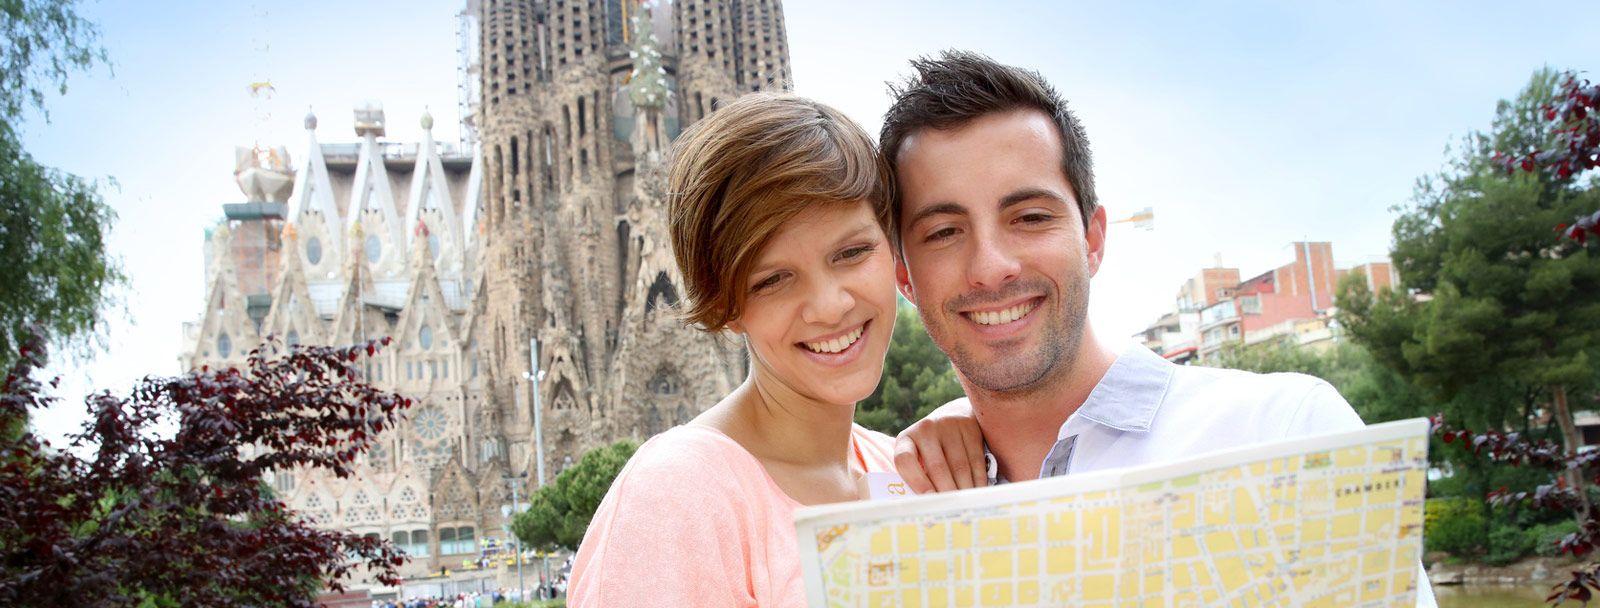 barcelona dating free